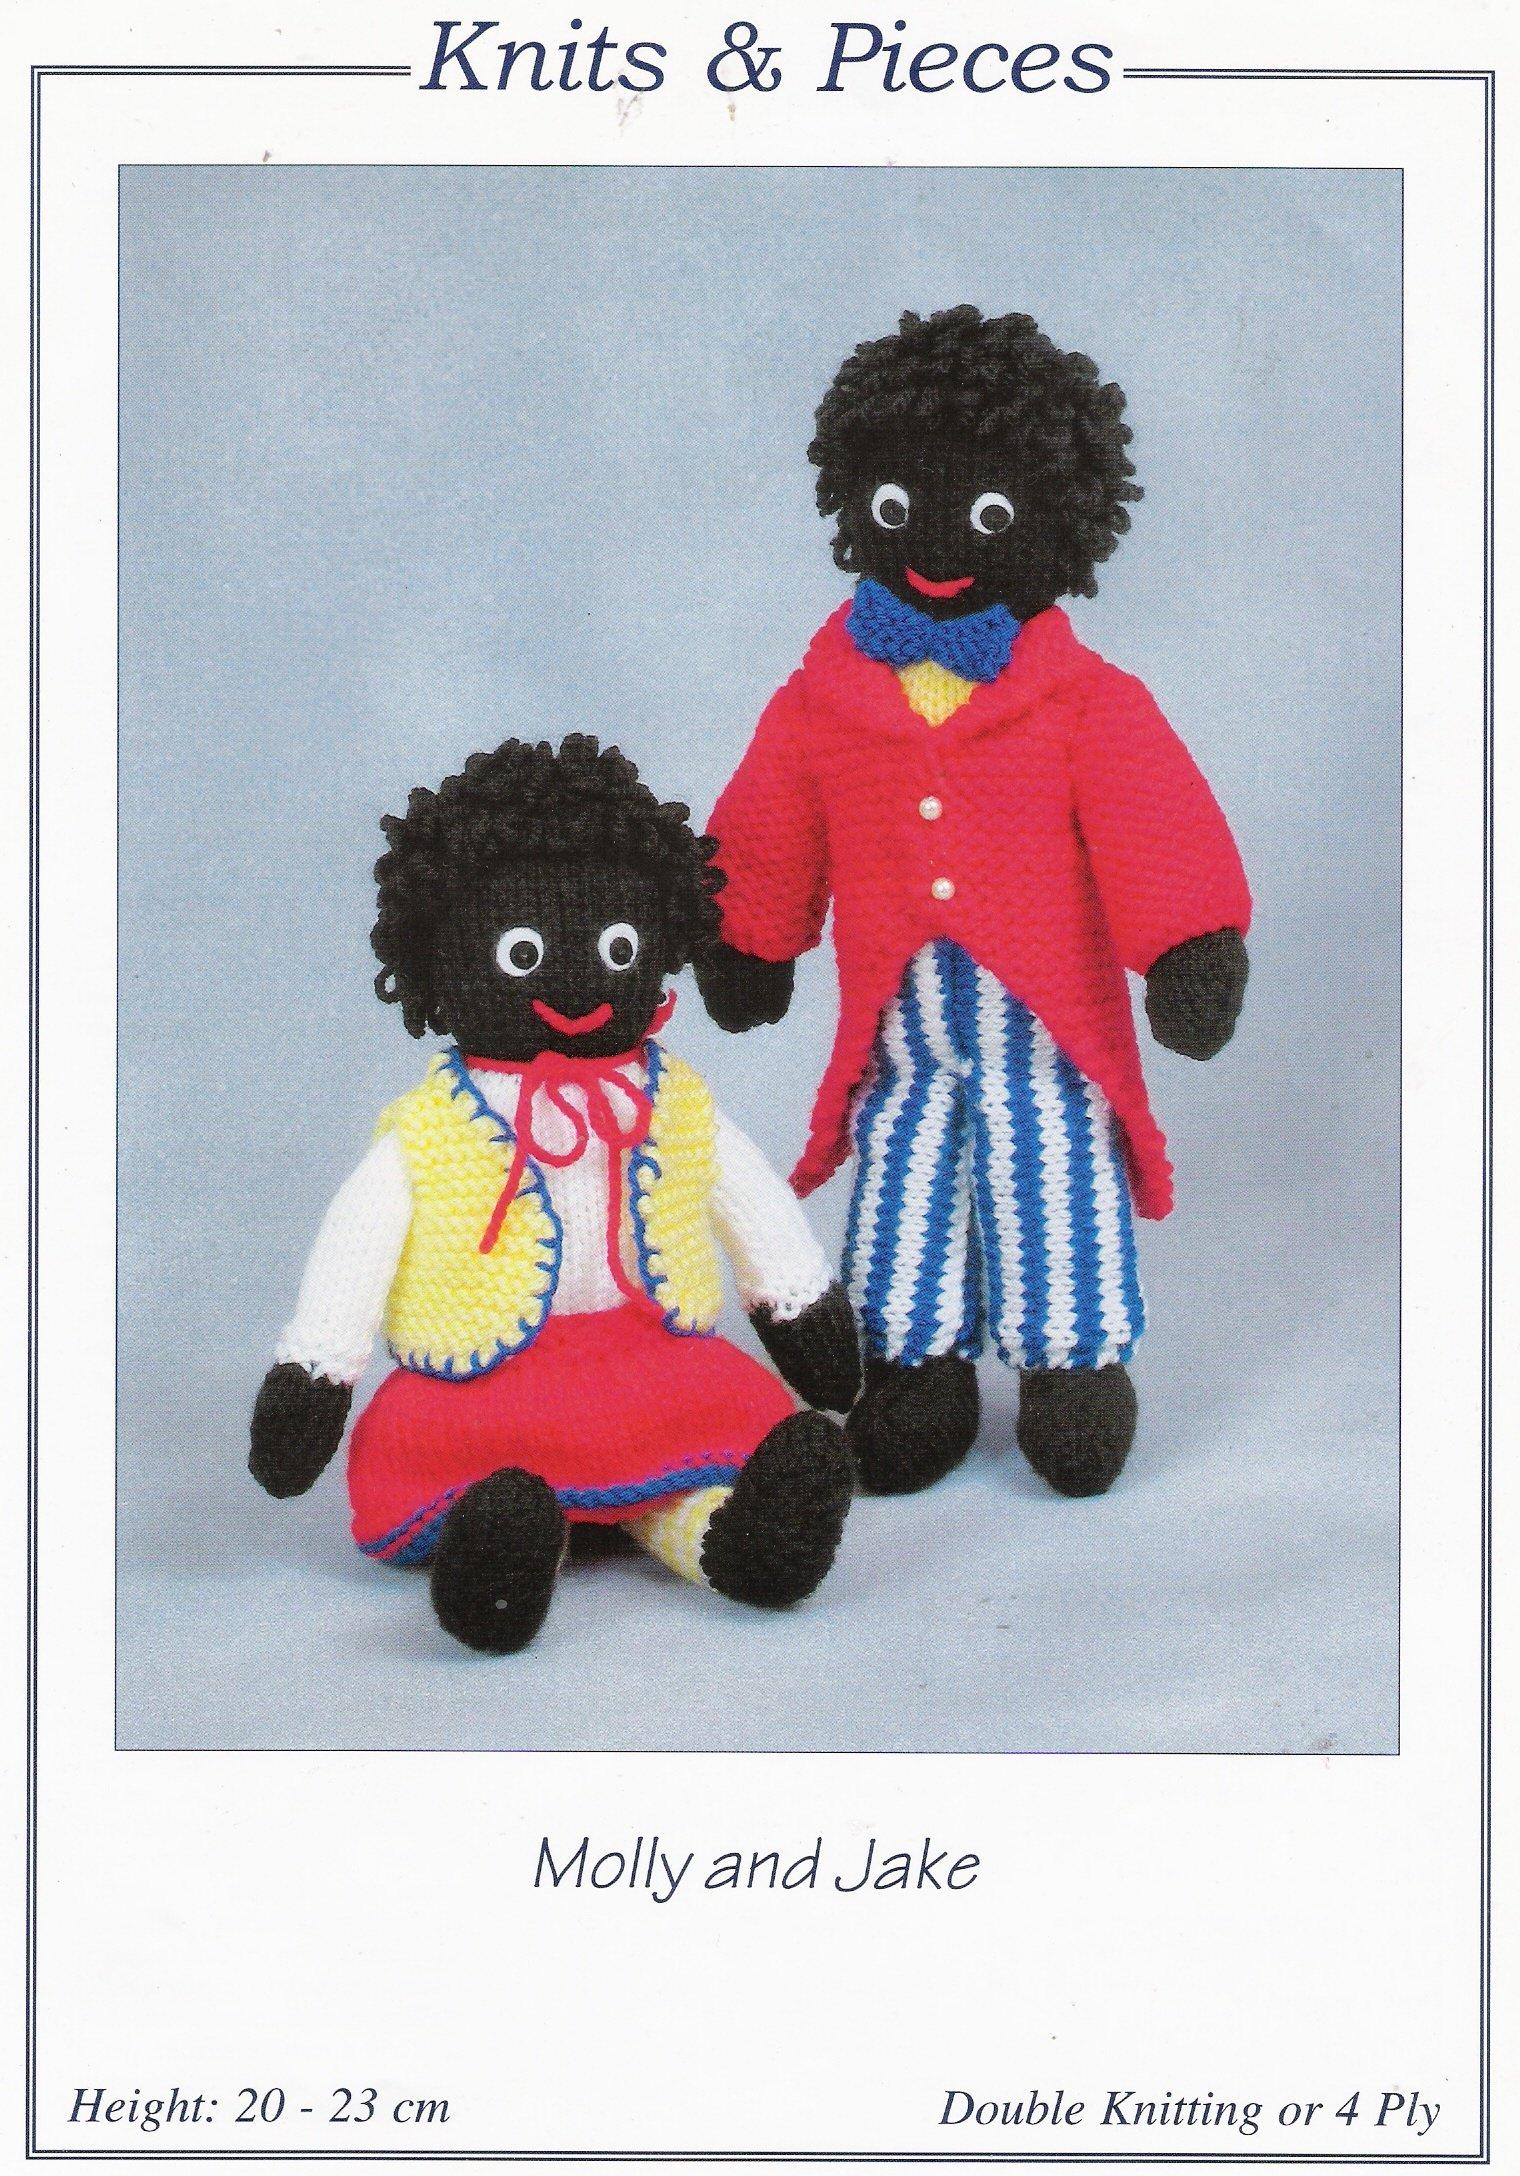 Molly and Jake Golly Knitting Pattern: Amazon.co.uk: Sandra Polley ...